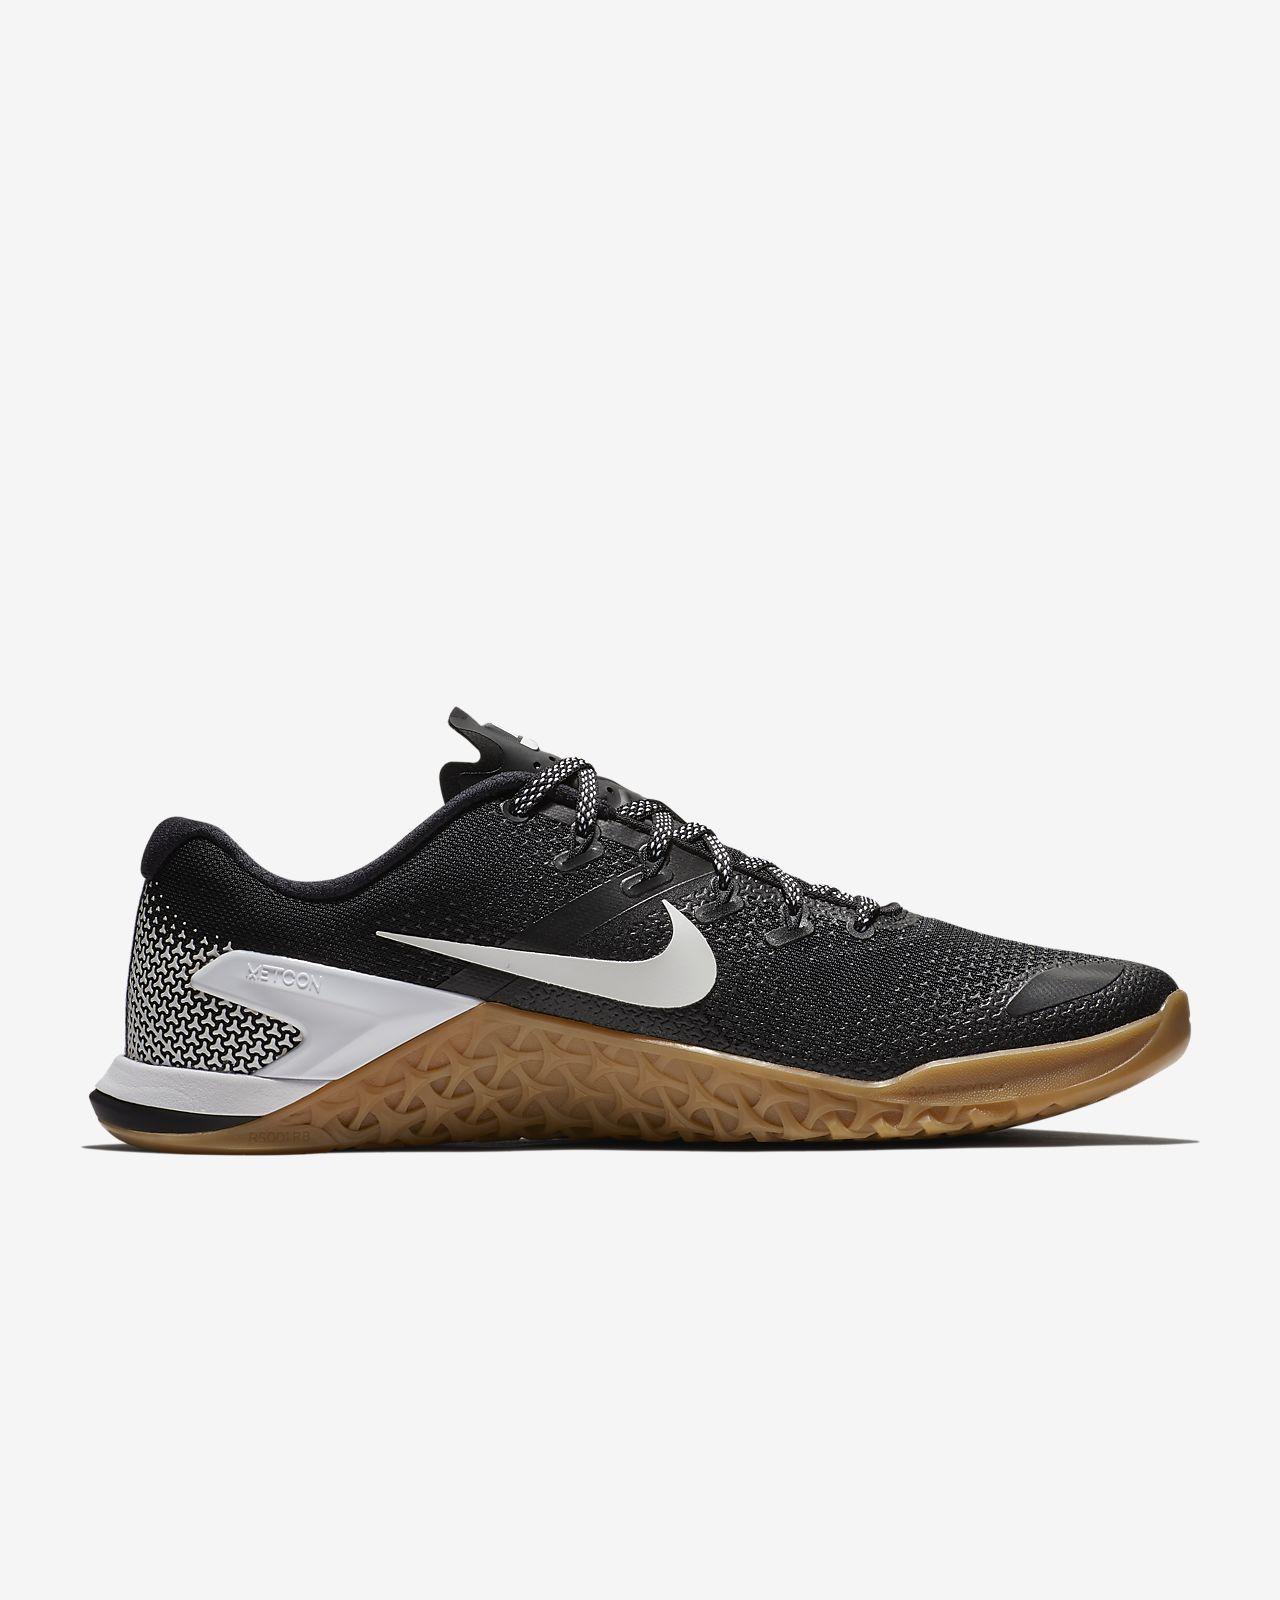 7f1425e9d4d ... Calzado de cross-training y levantamiento de pesas para hombre Nike  Metcon 4